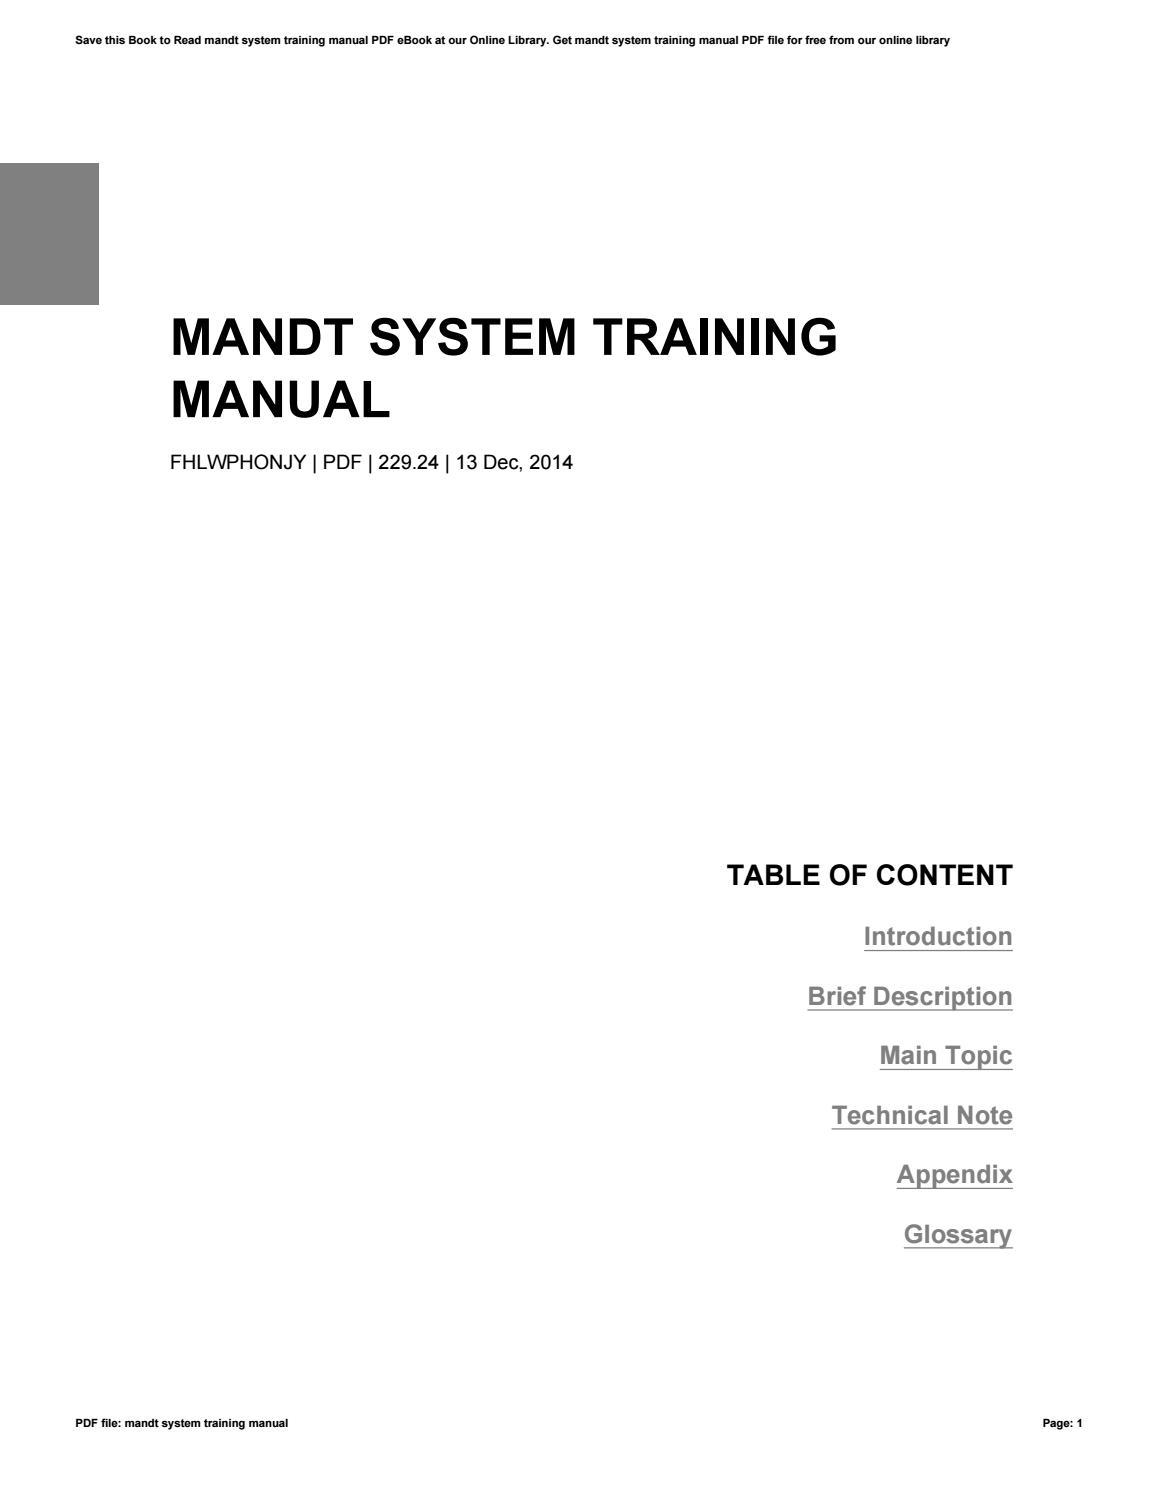 mandt system training manual by elizabethcastro2672